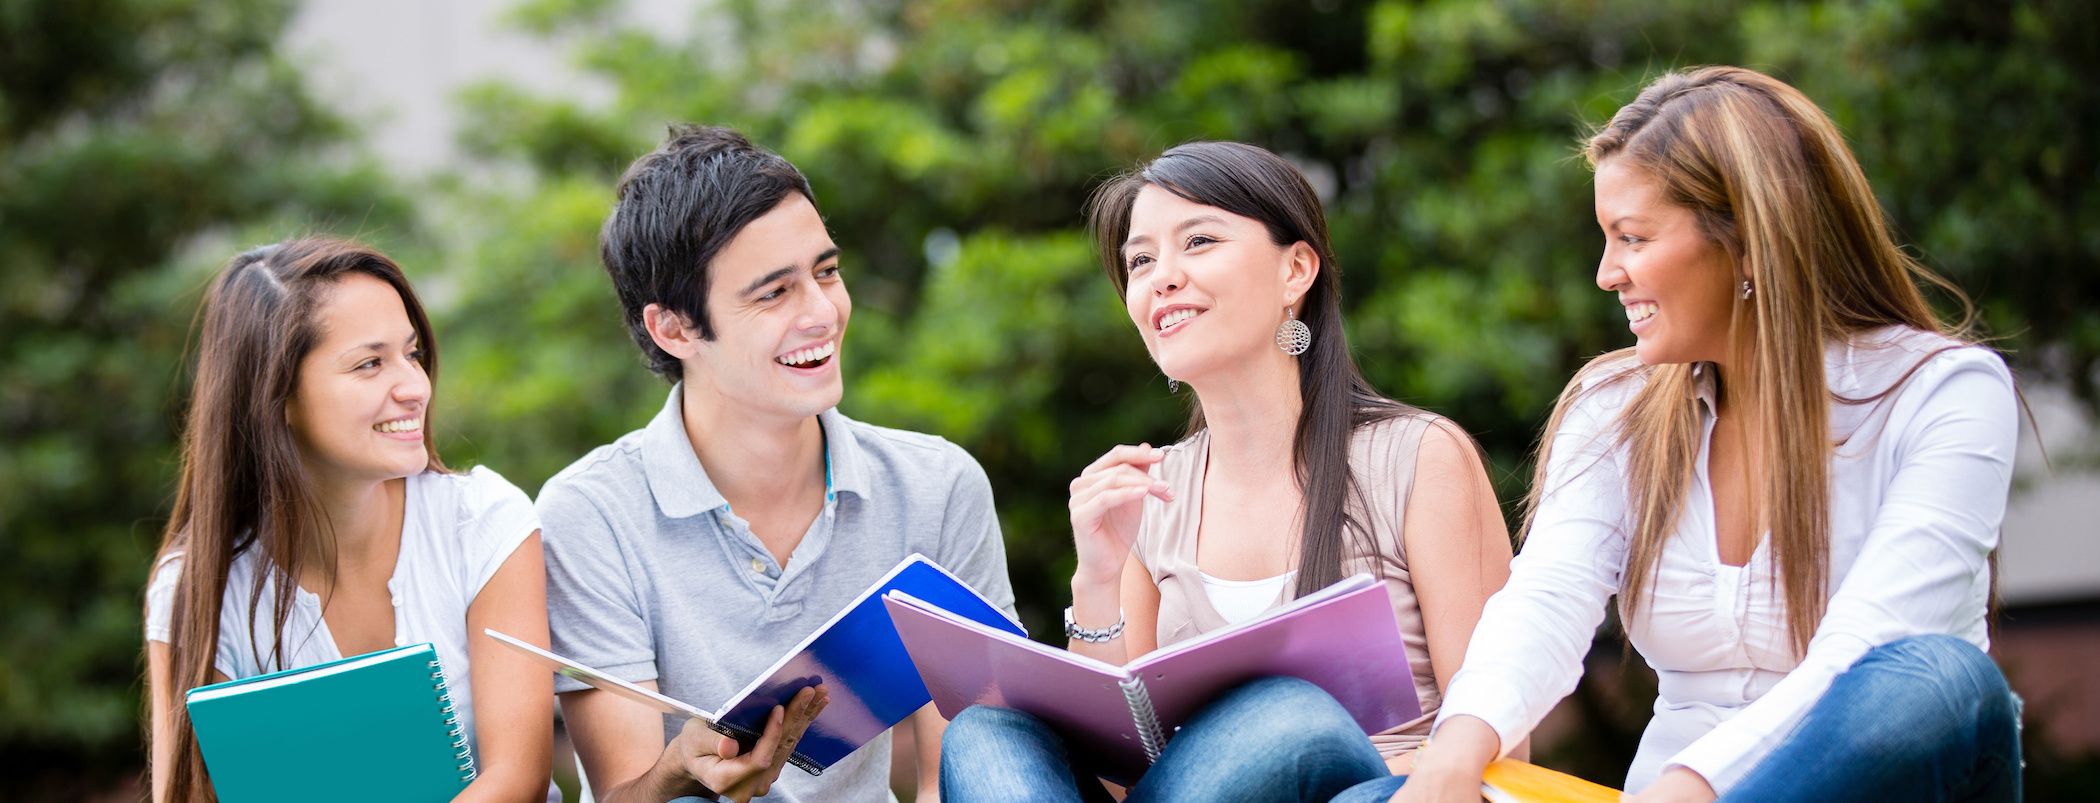 Foto students